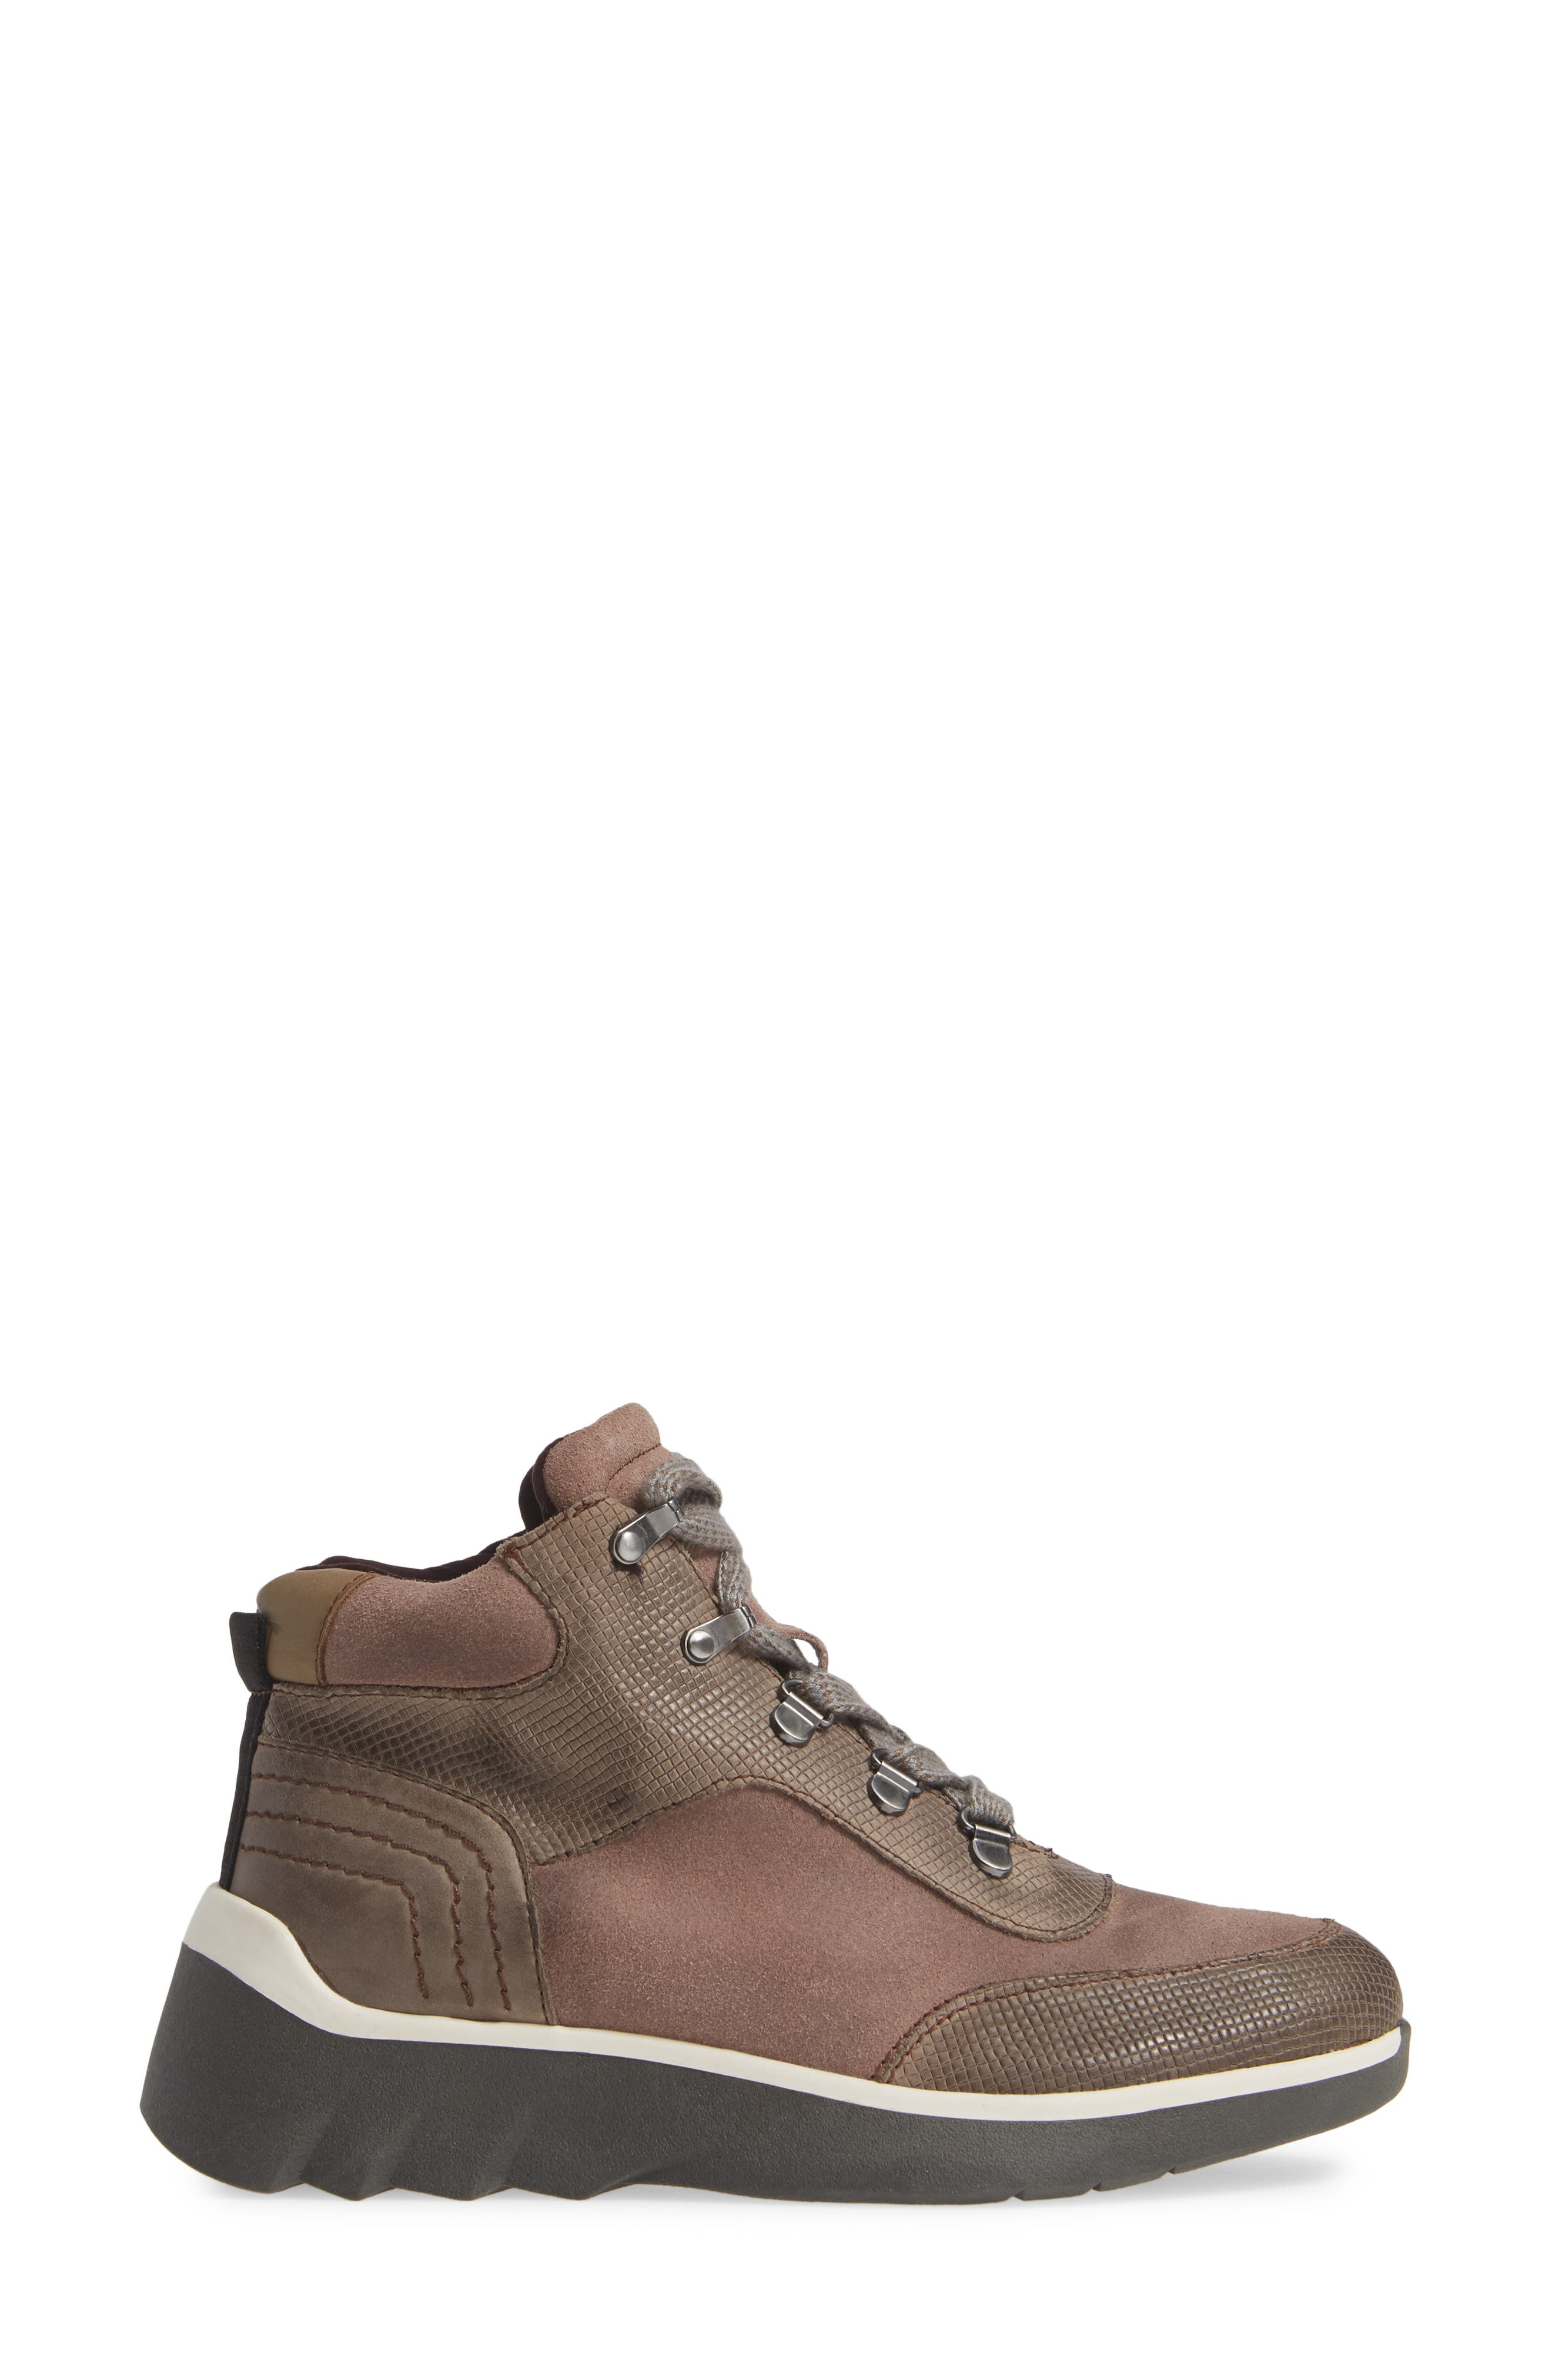 Commuter Sneaker,                             Alternate thumbnail 3, color,                             CINDER LEATHER